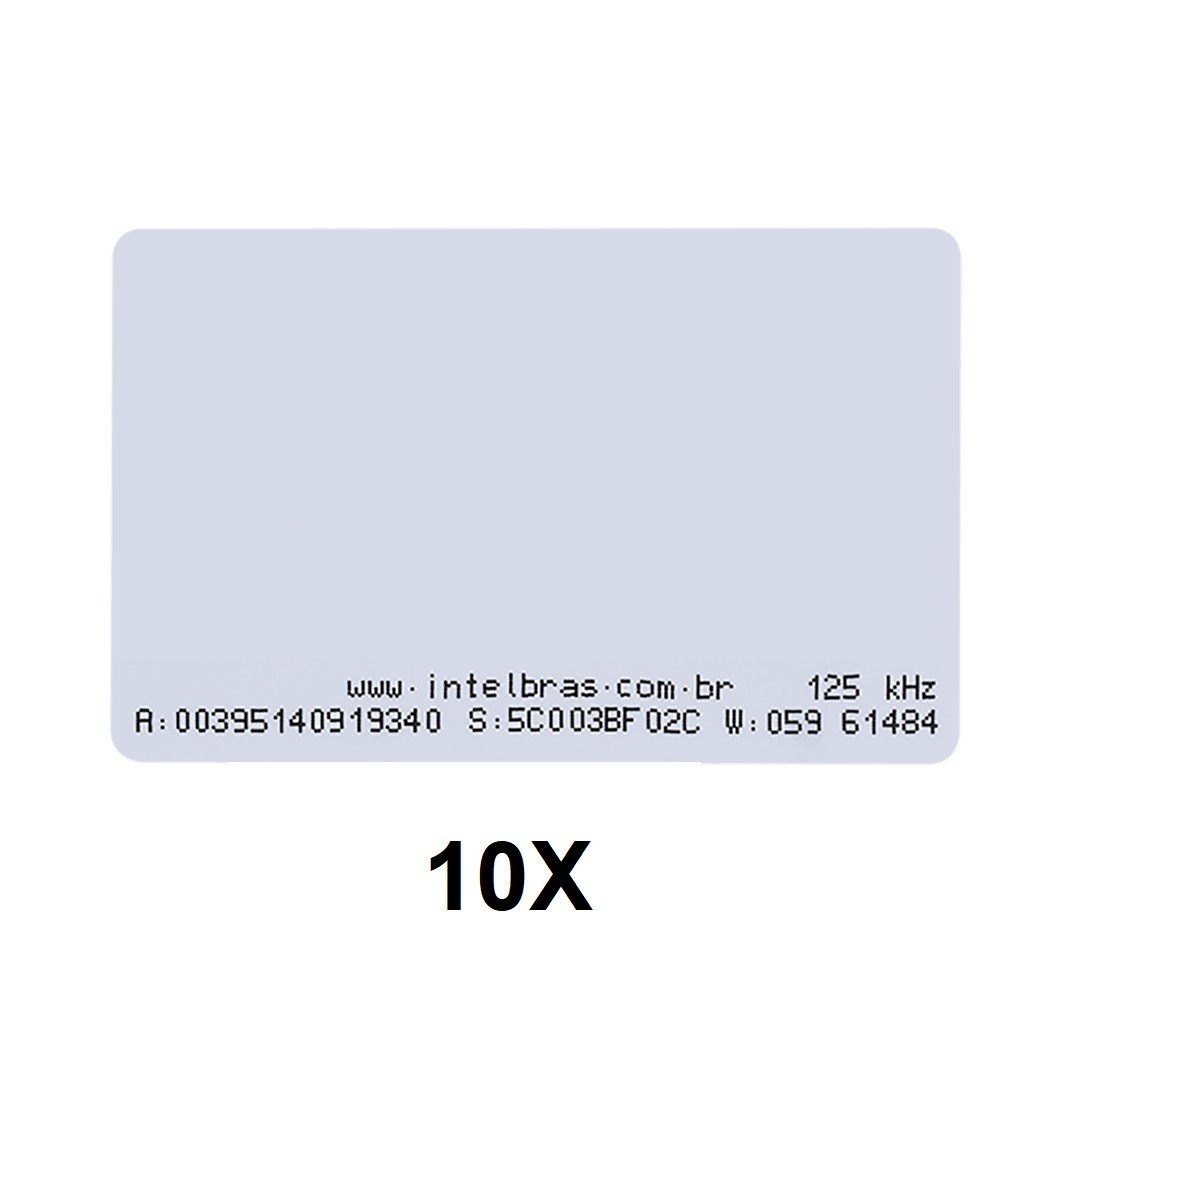 Kit 10 Cartões de Proximidade RFID 125 kHz Intelbras TH 2000